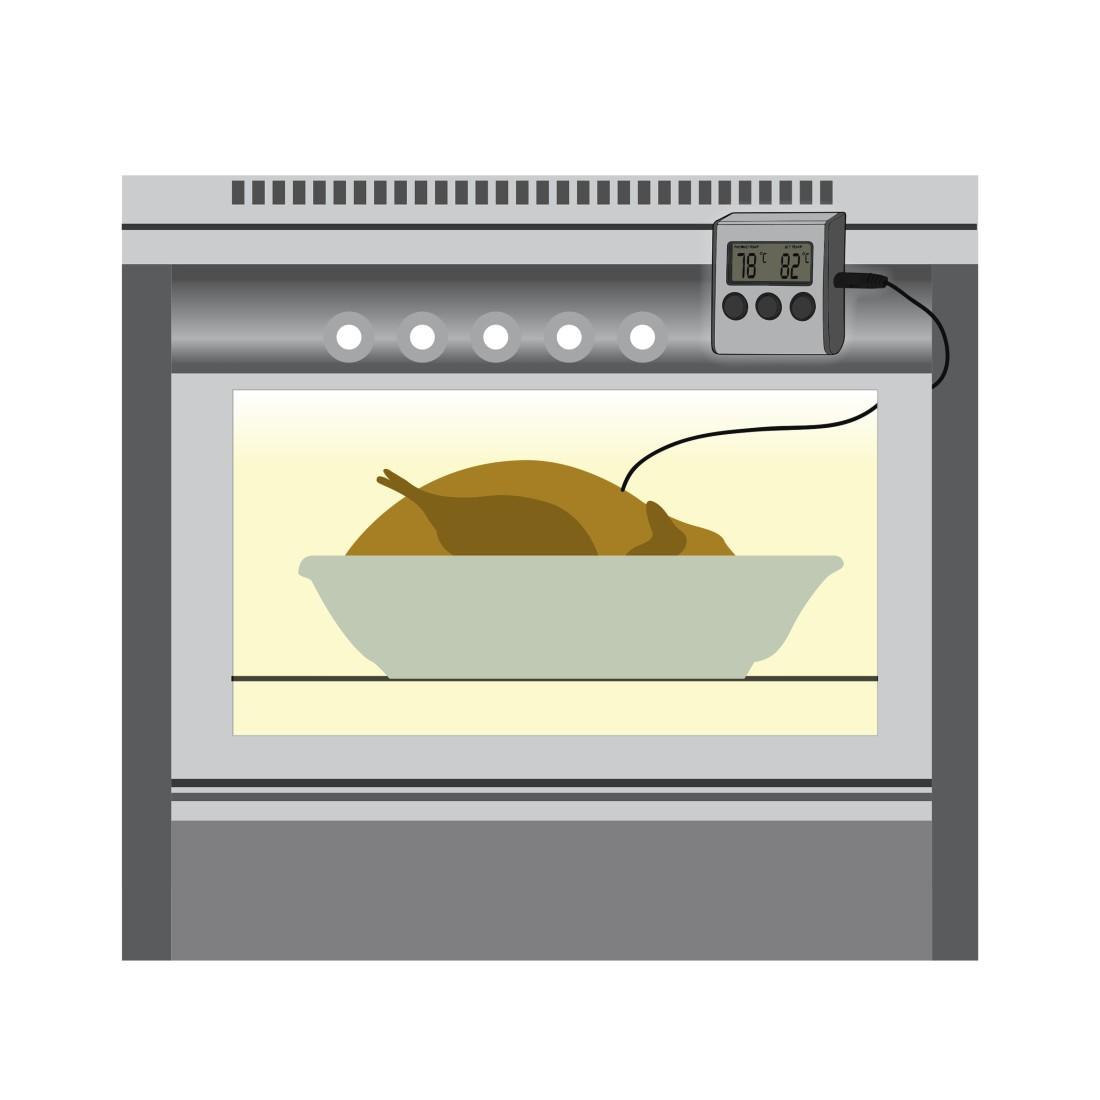 blanco electric oven how to set alarm